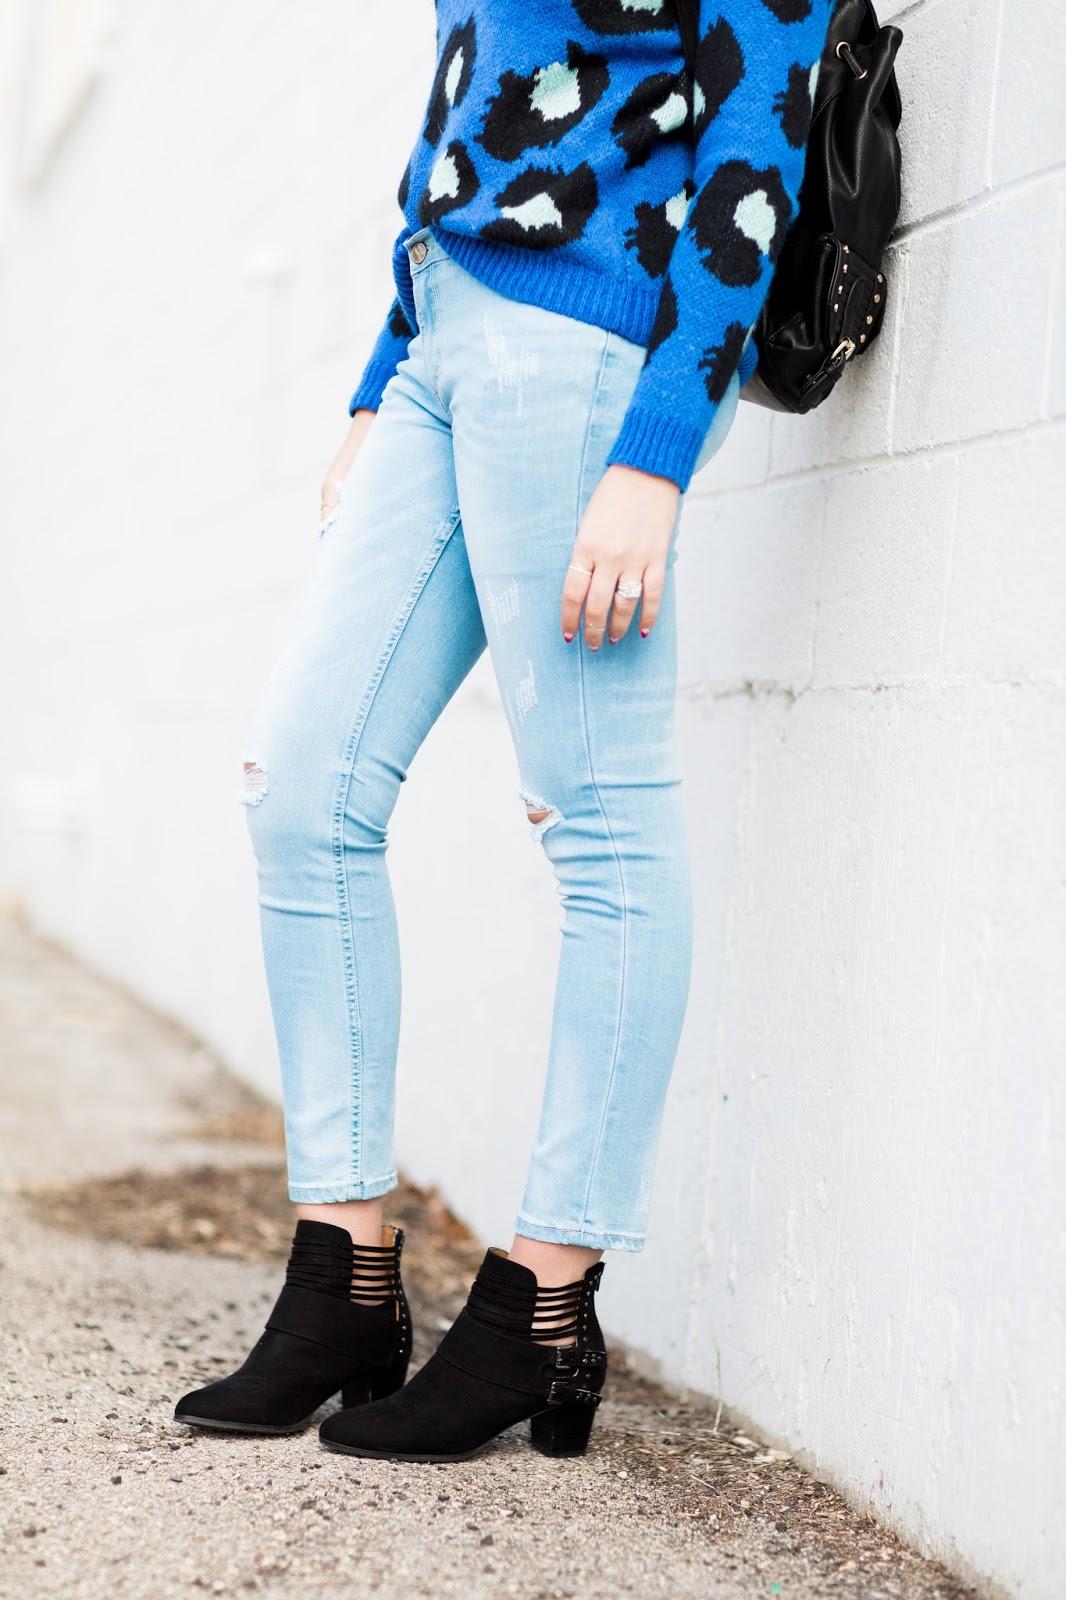 ASOS Jeans, Black Booties